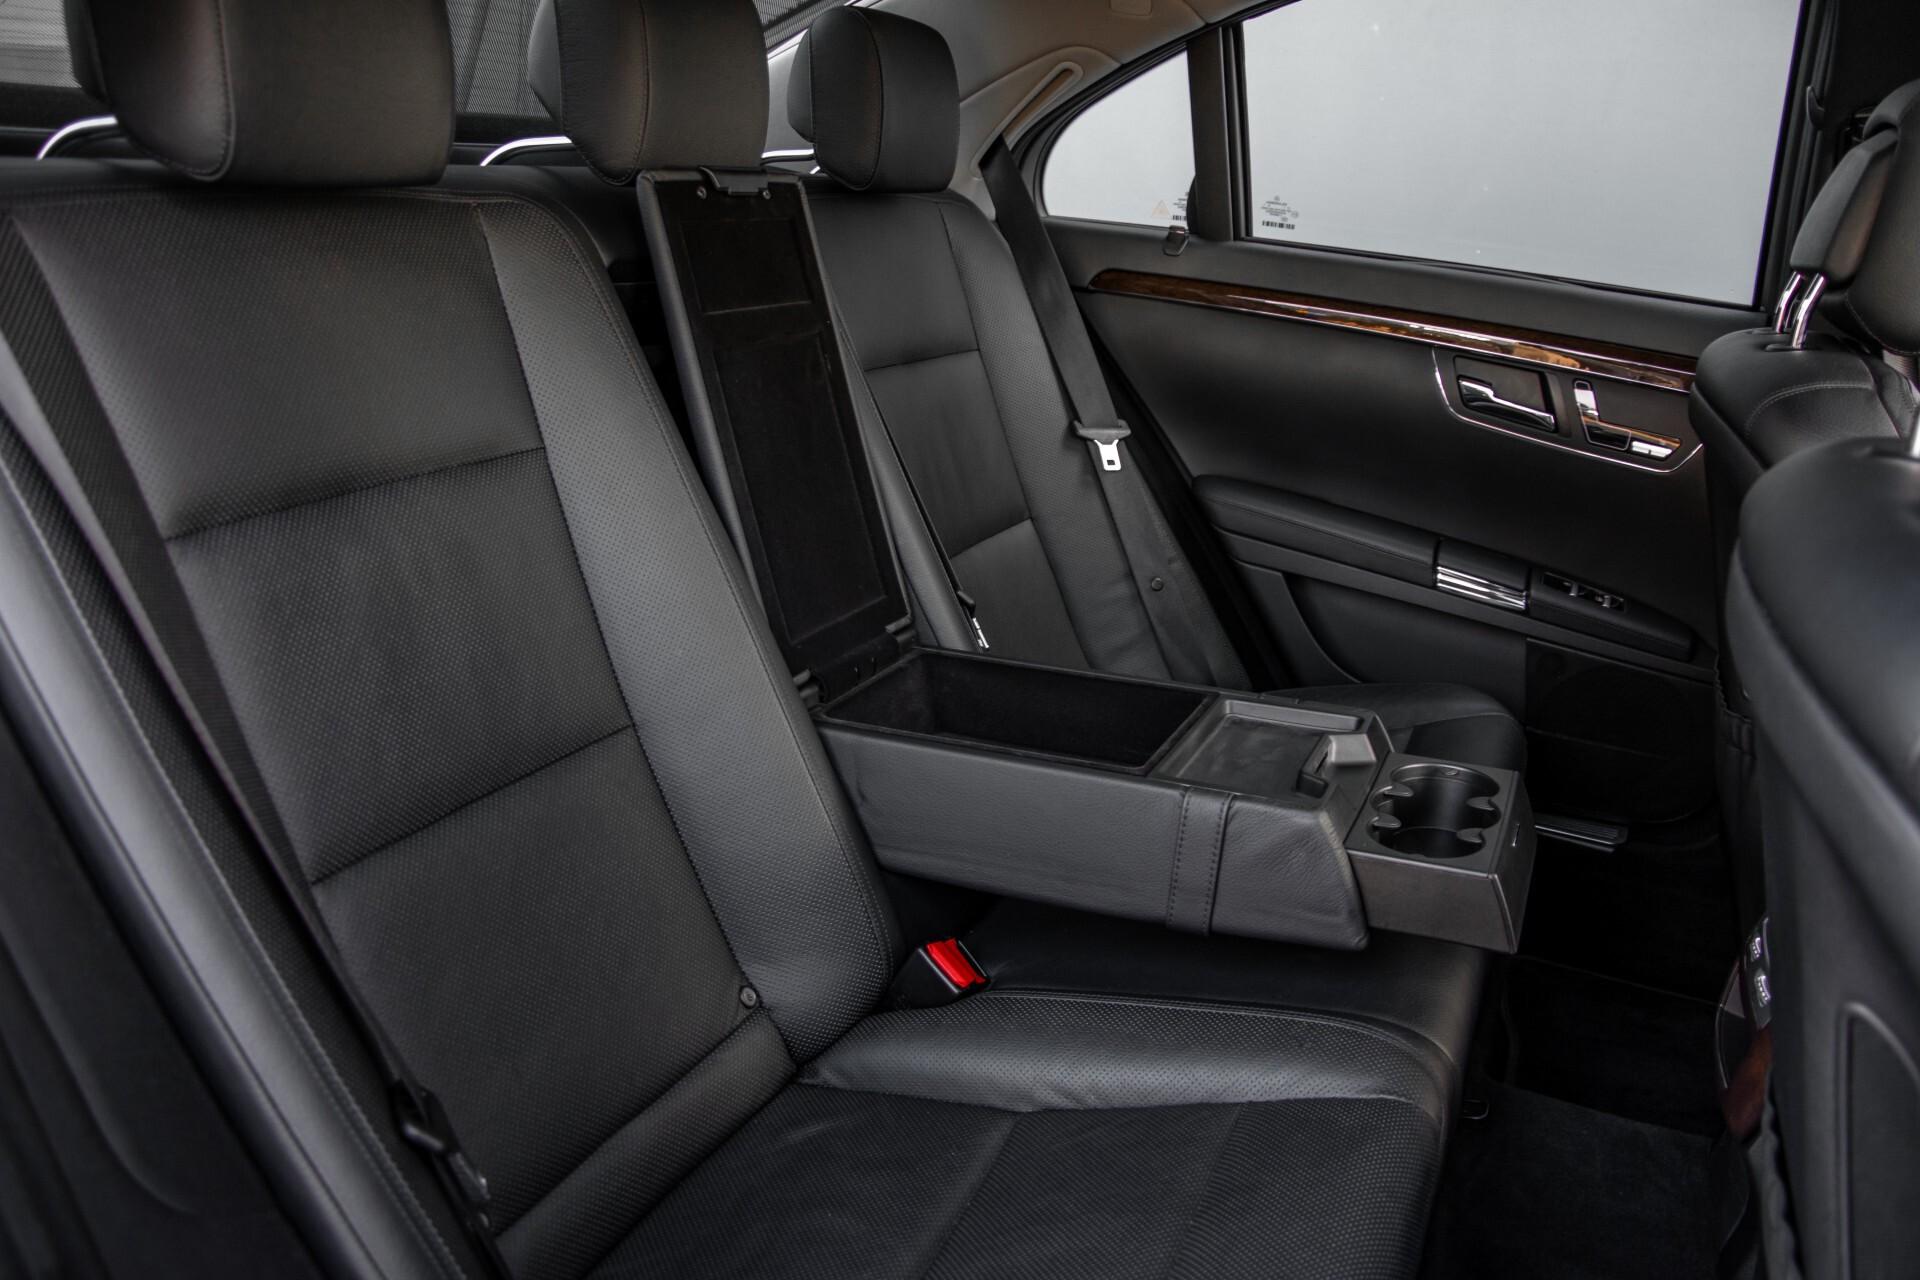 Mercedes-Benz S-Klasse 350 Bluetec Keyless/Distronic/Nightvision/Schuifdak/Harman-Kardon Aut7 Foto 6